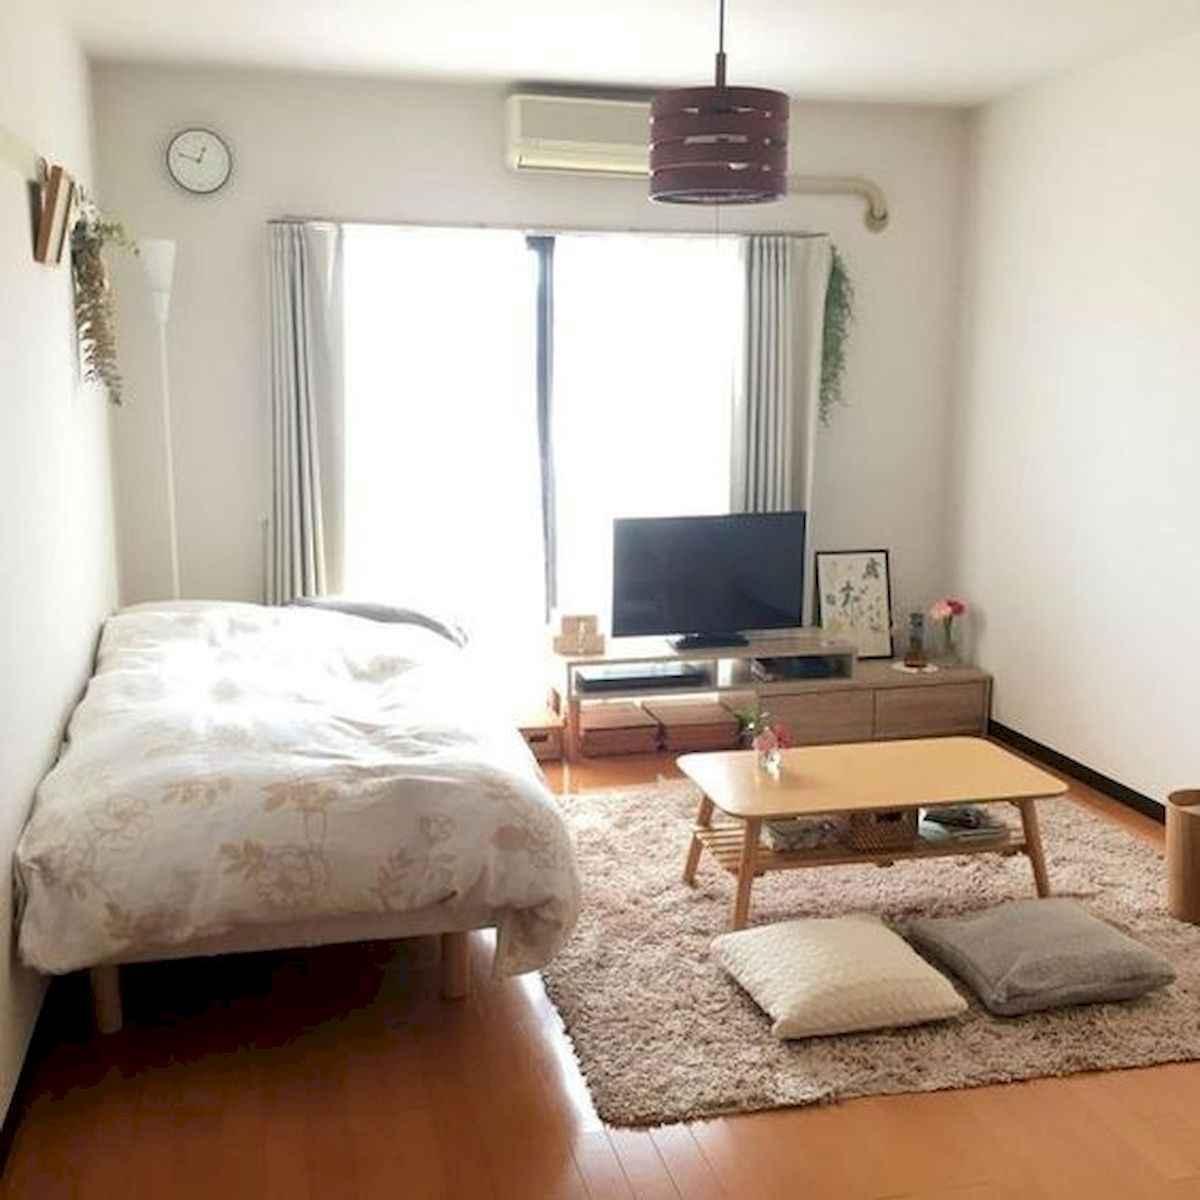 80 Fantastic Small Apartment Bedroom College Design Ideas and Decor (73)